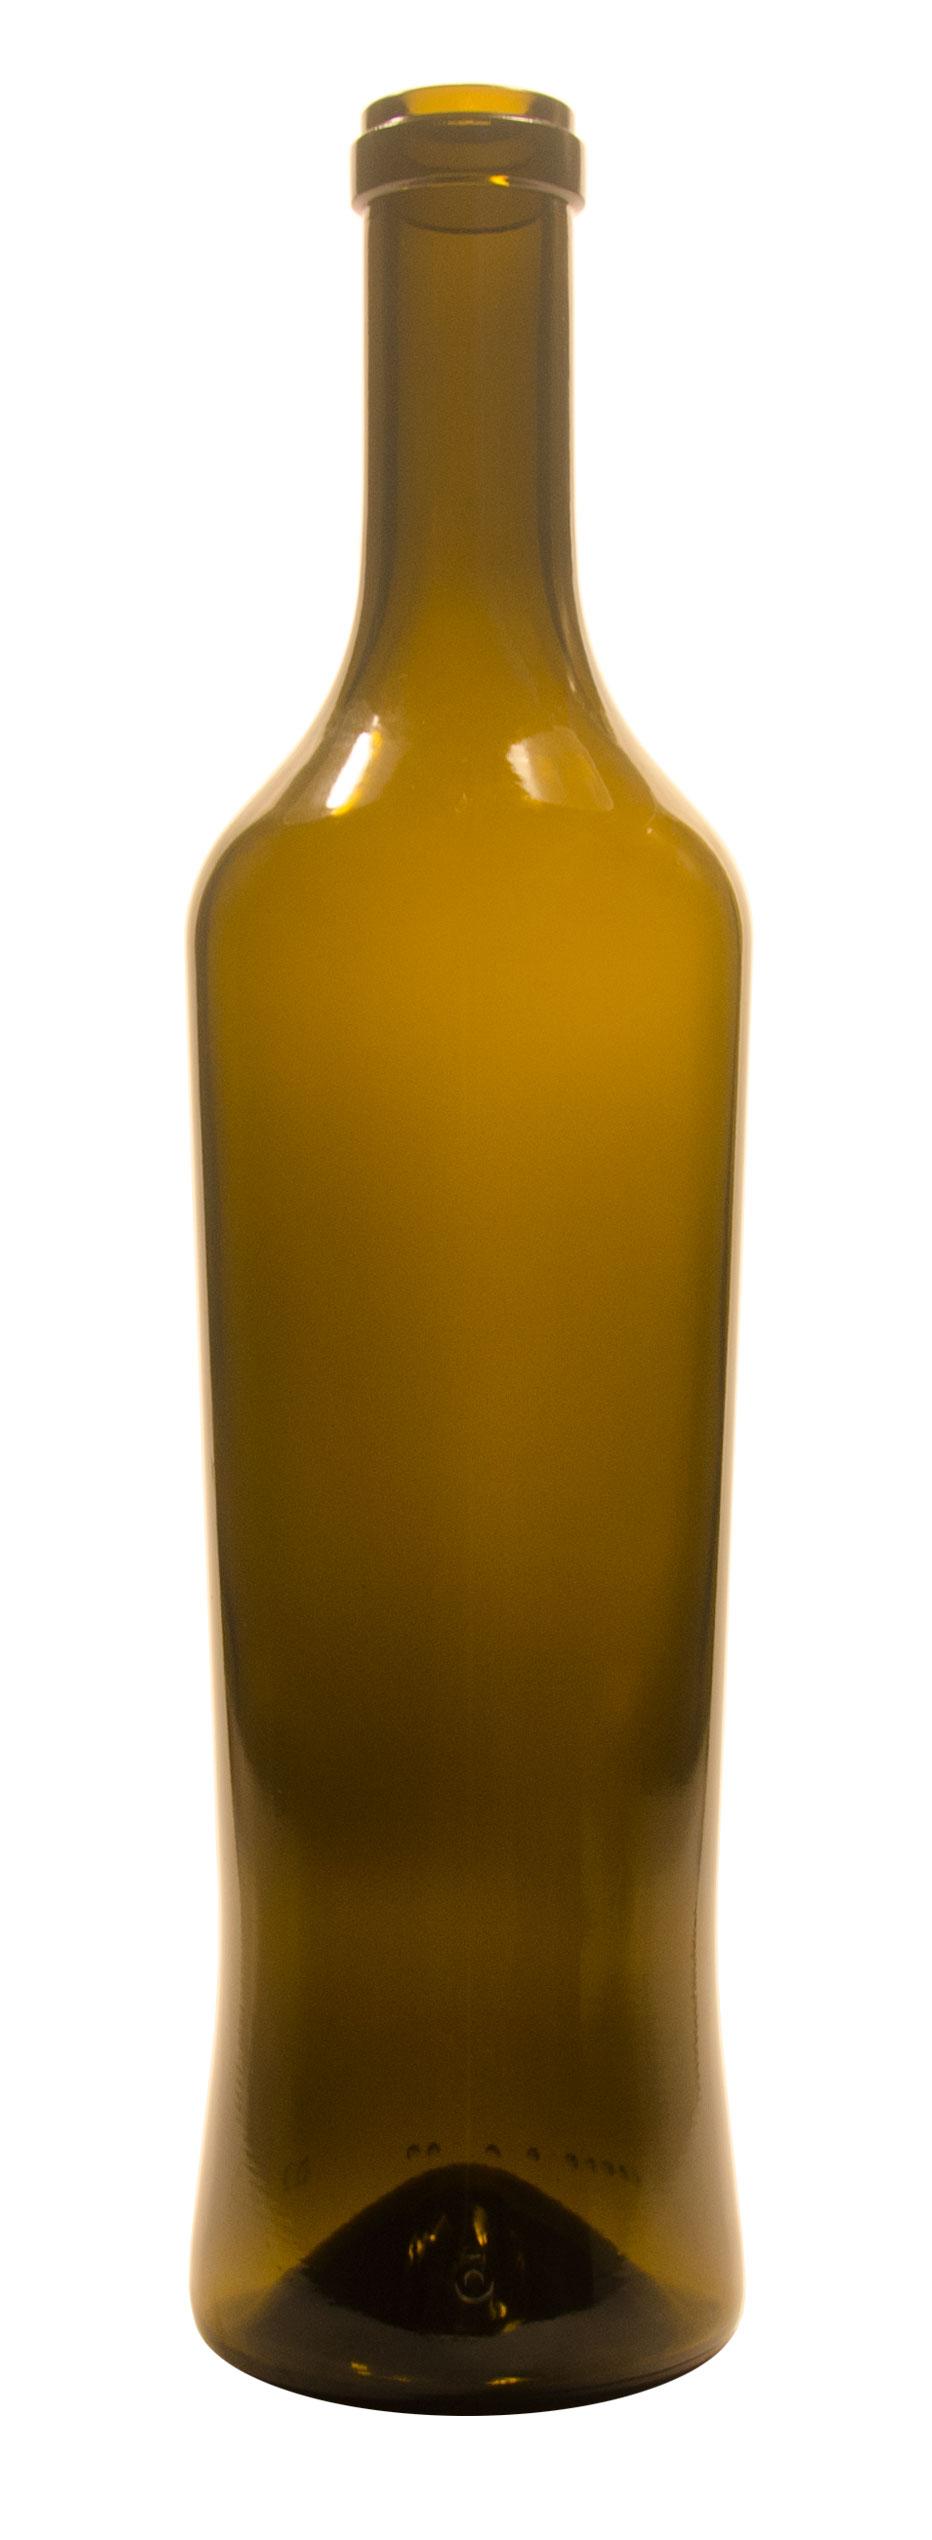 Laurie_750ml_antique_green_wine_bottle_B